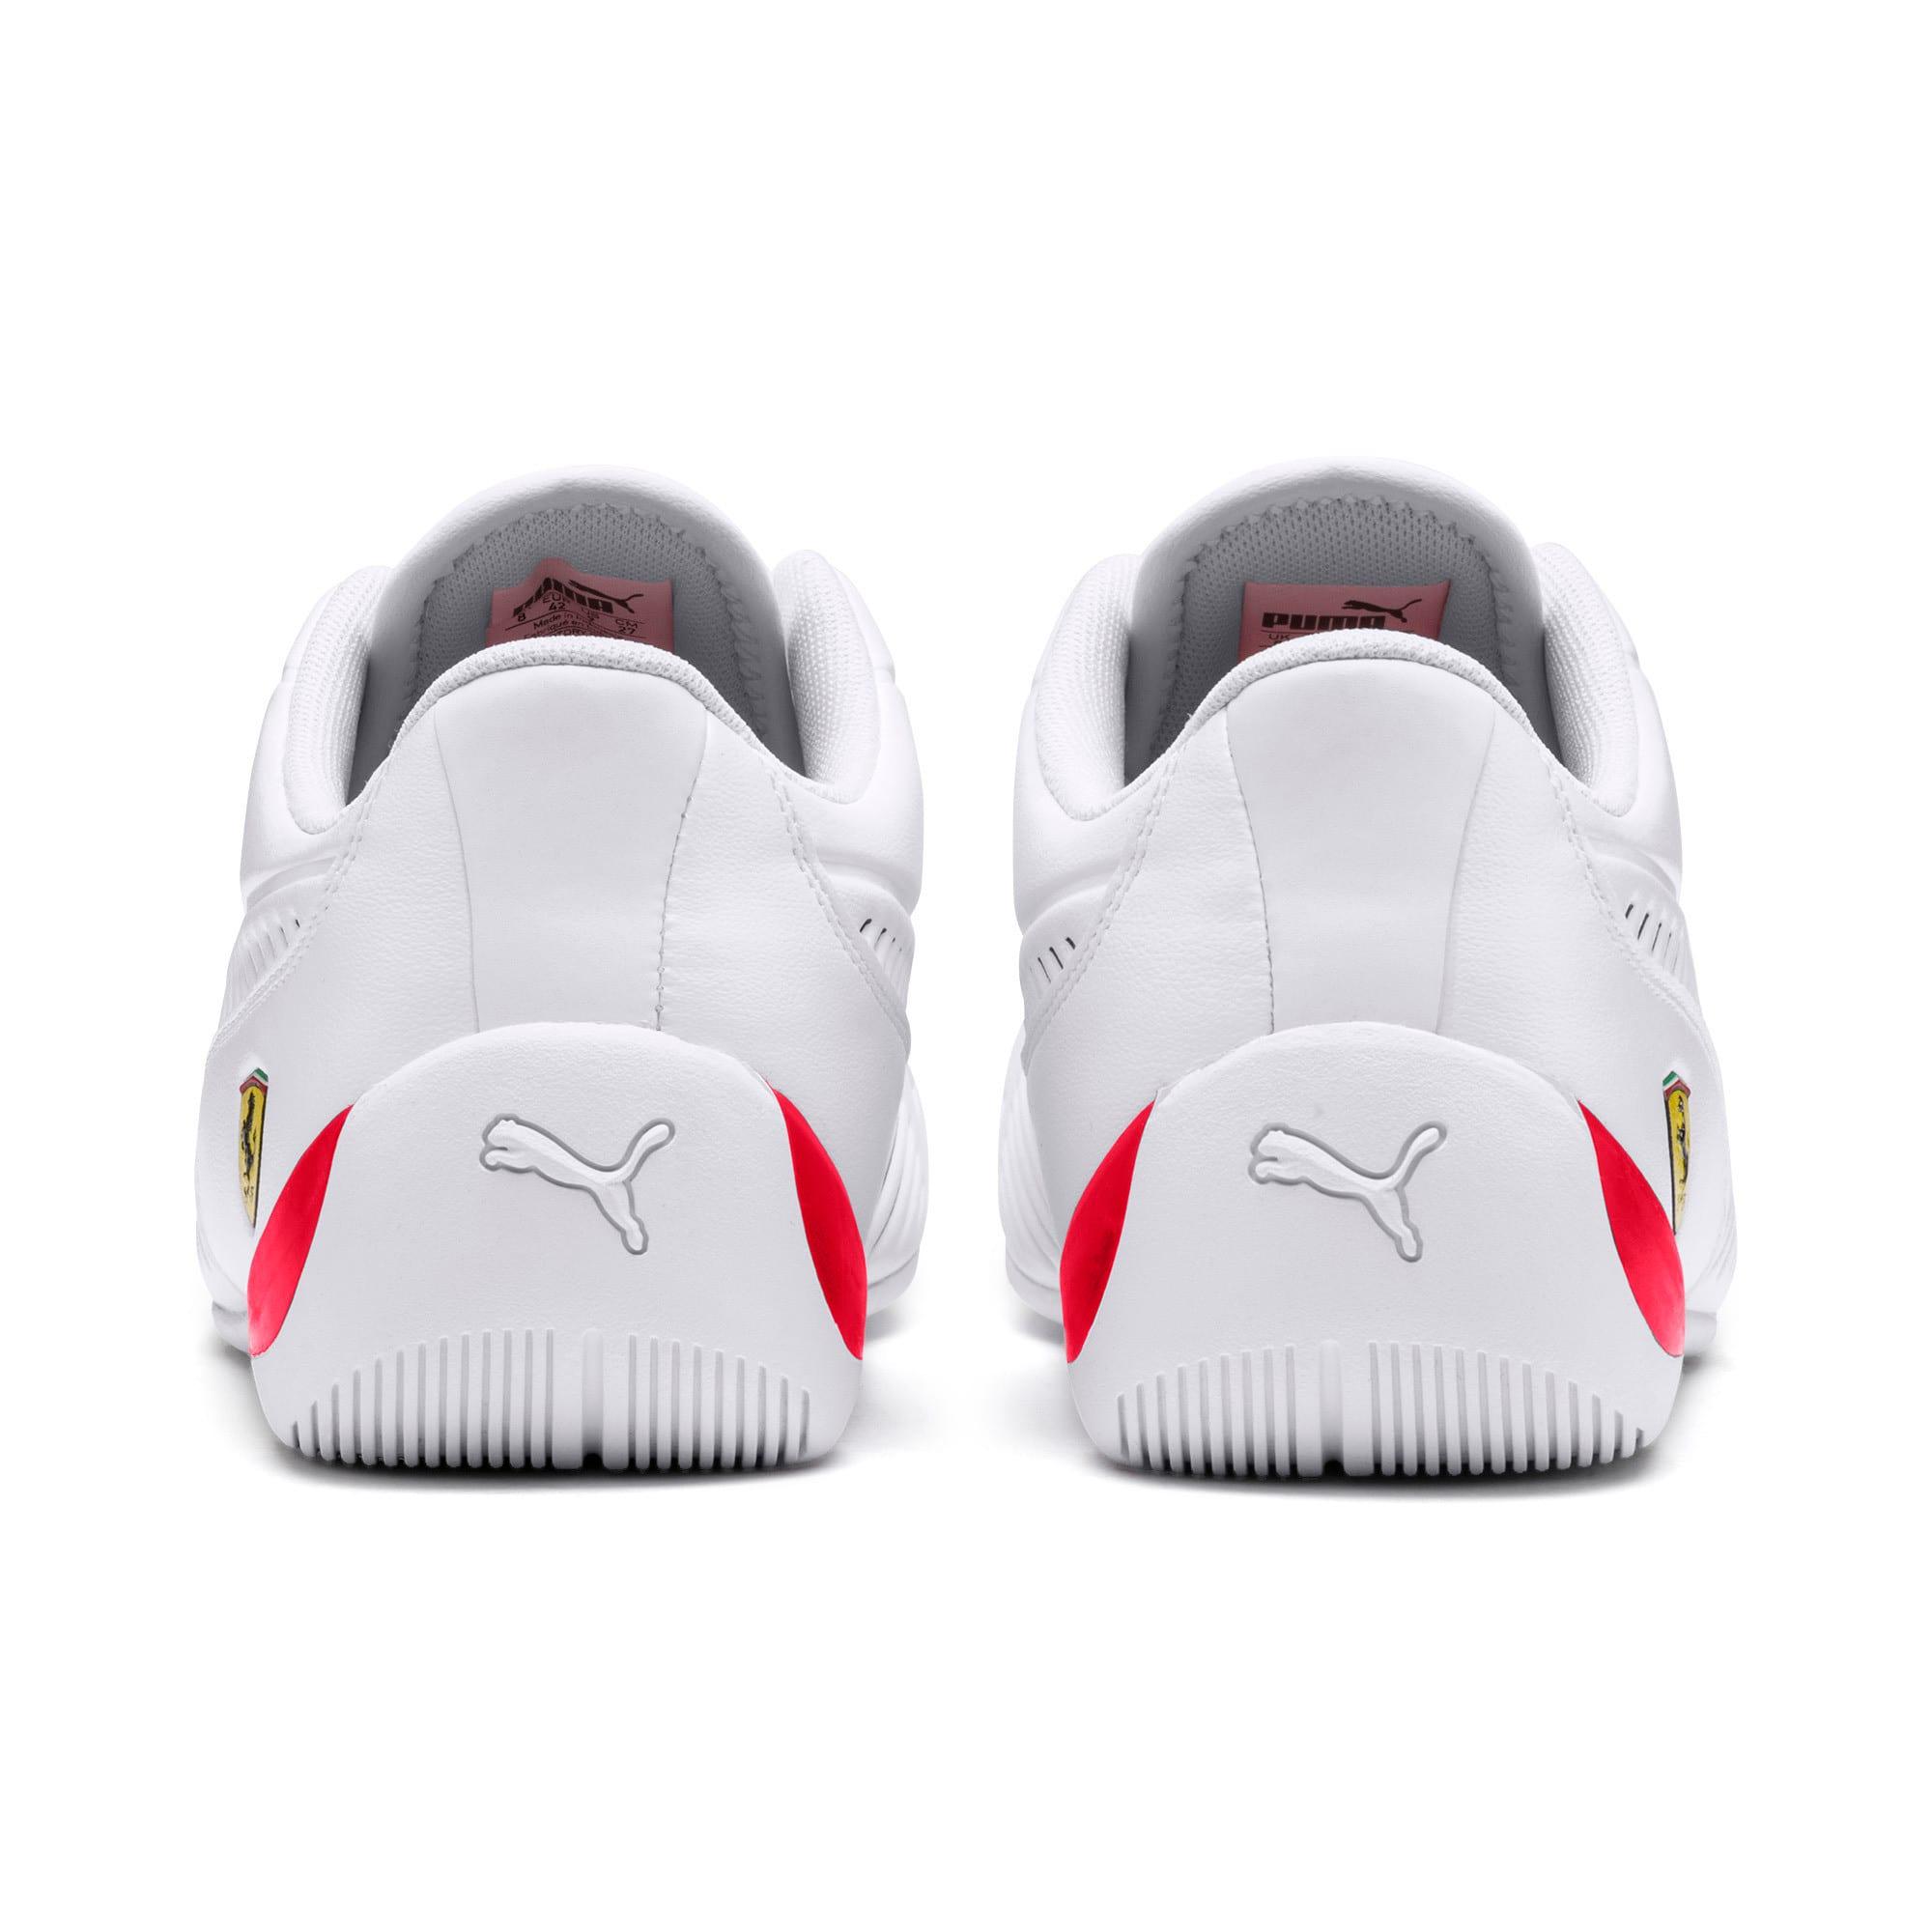 Thumbnail 5 of Scuderia Ferrari Drift Cat 7S Ultra Men's Shoes, Puma White-Rosso Corsa, medium